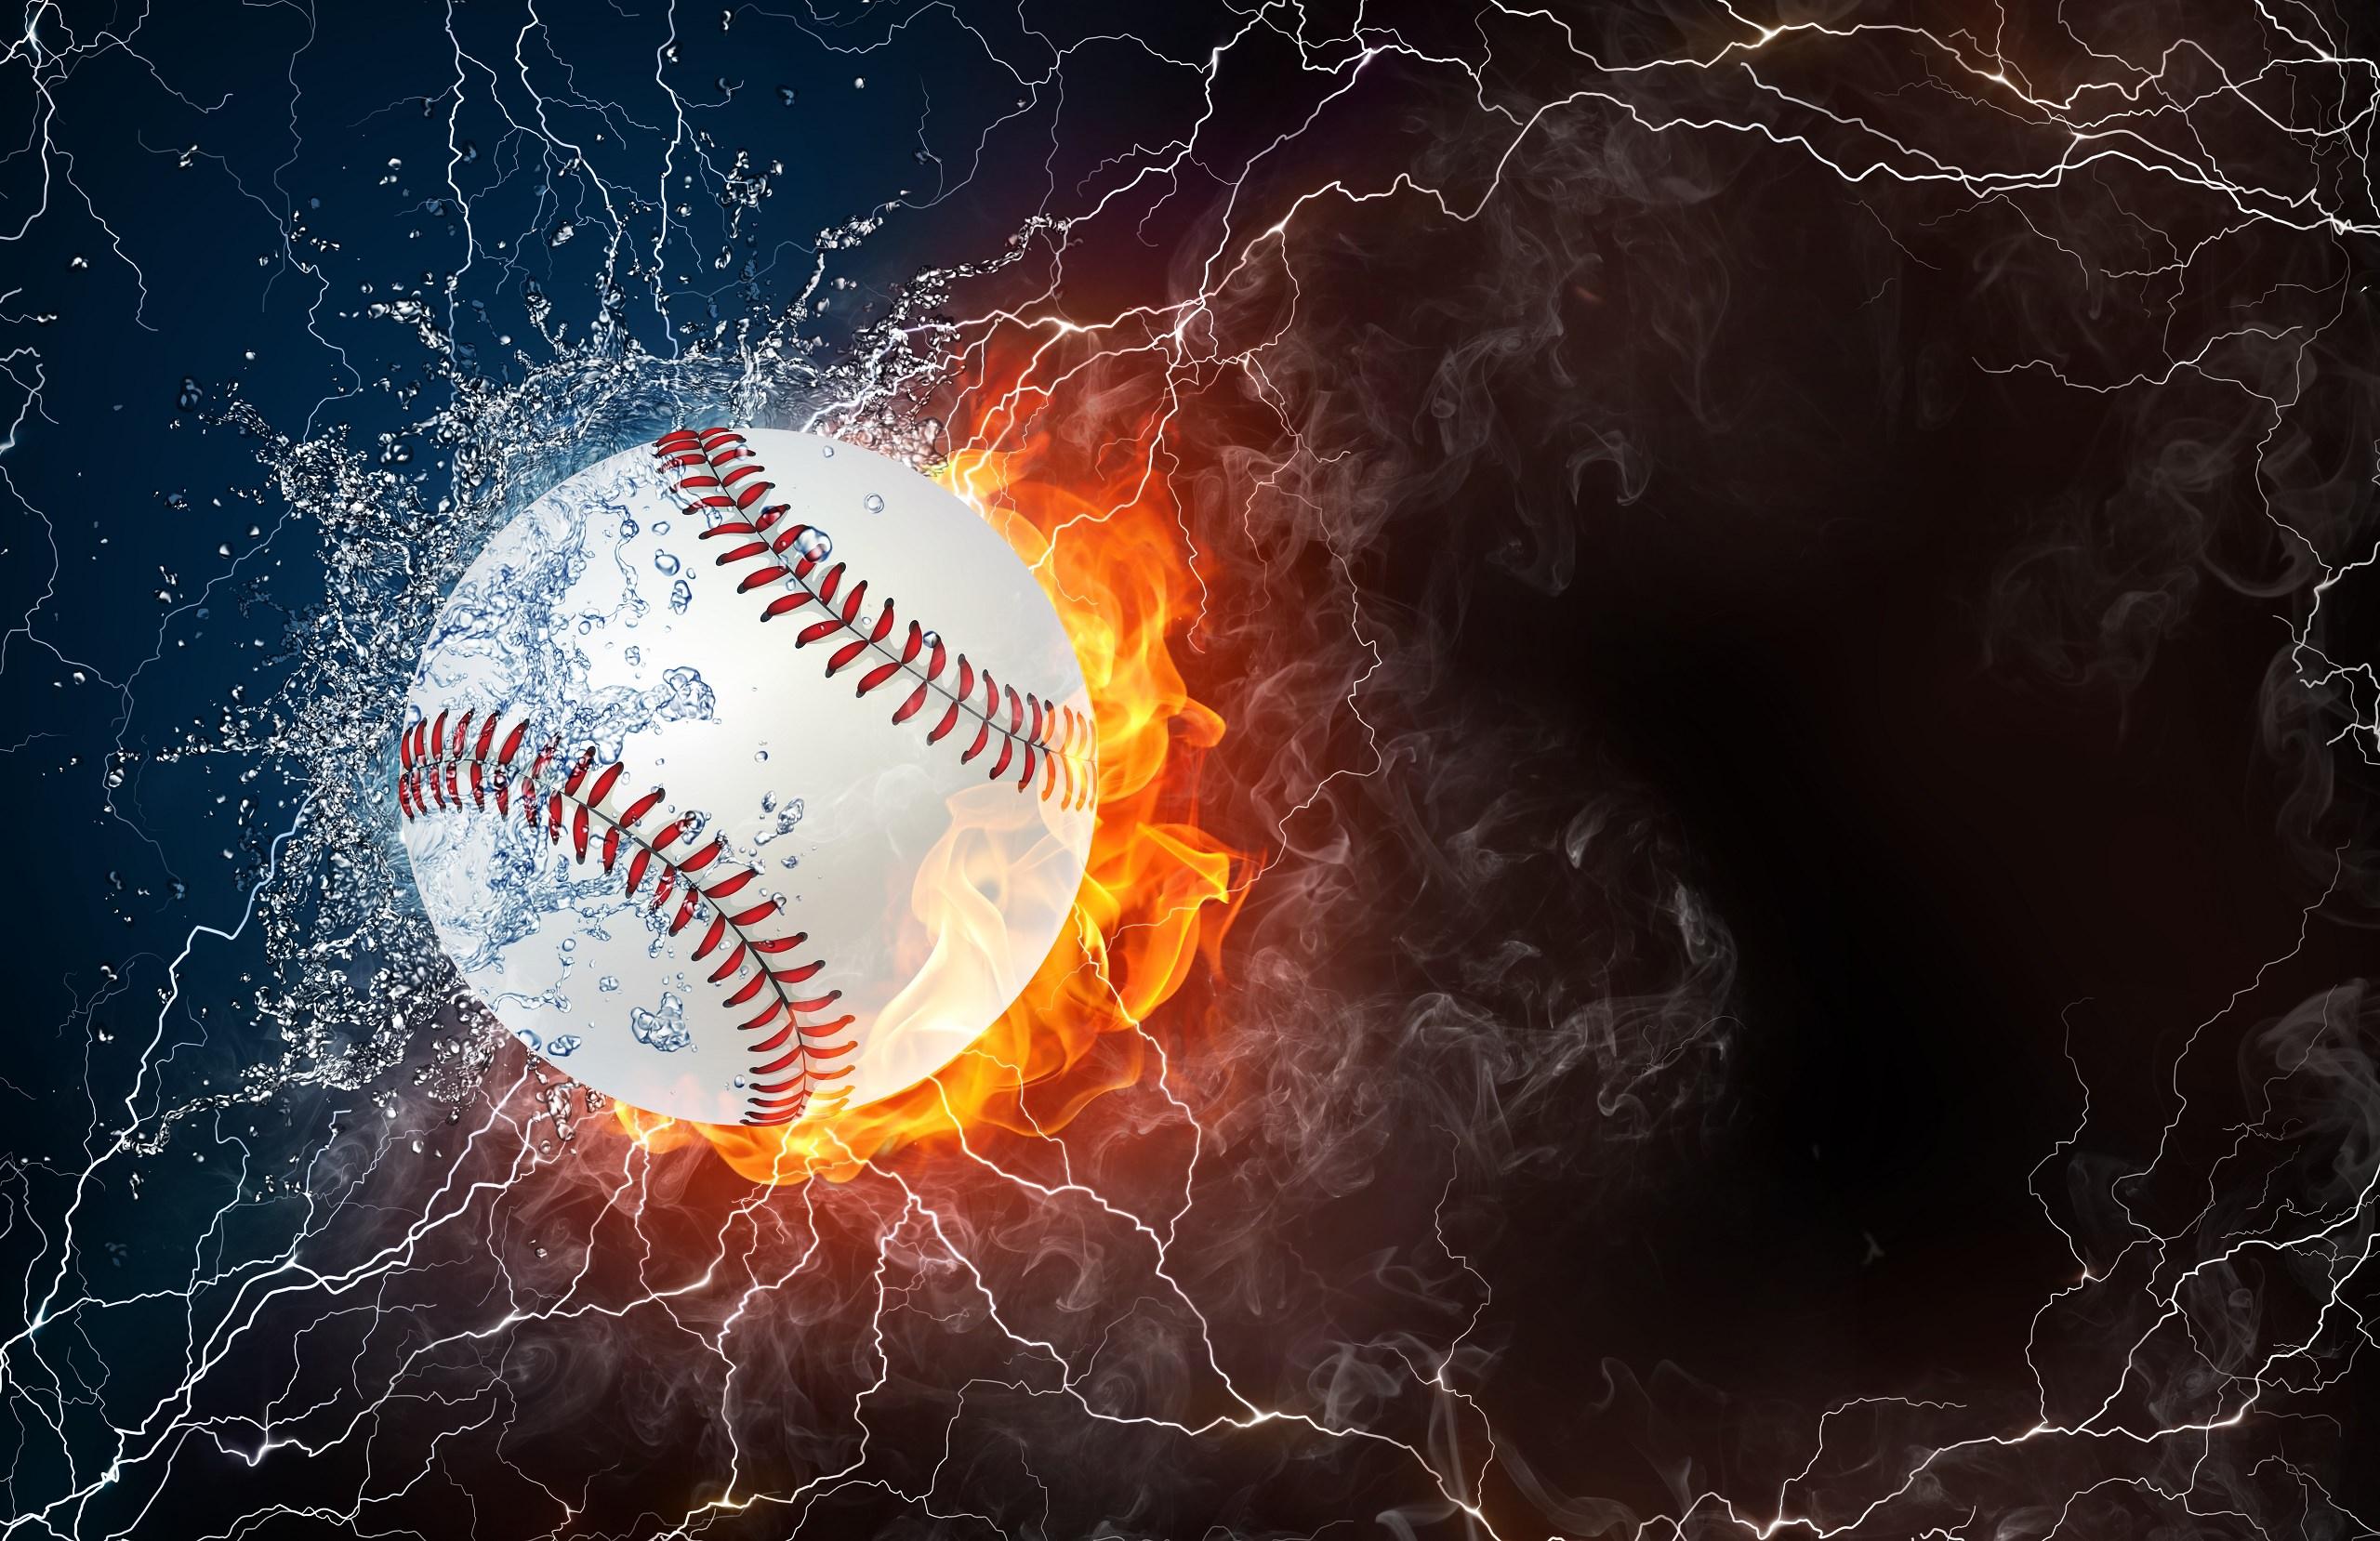 15 Baseball Backgrounds Wallpapers FreeCreatives 2560x1658